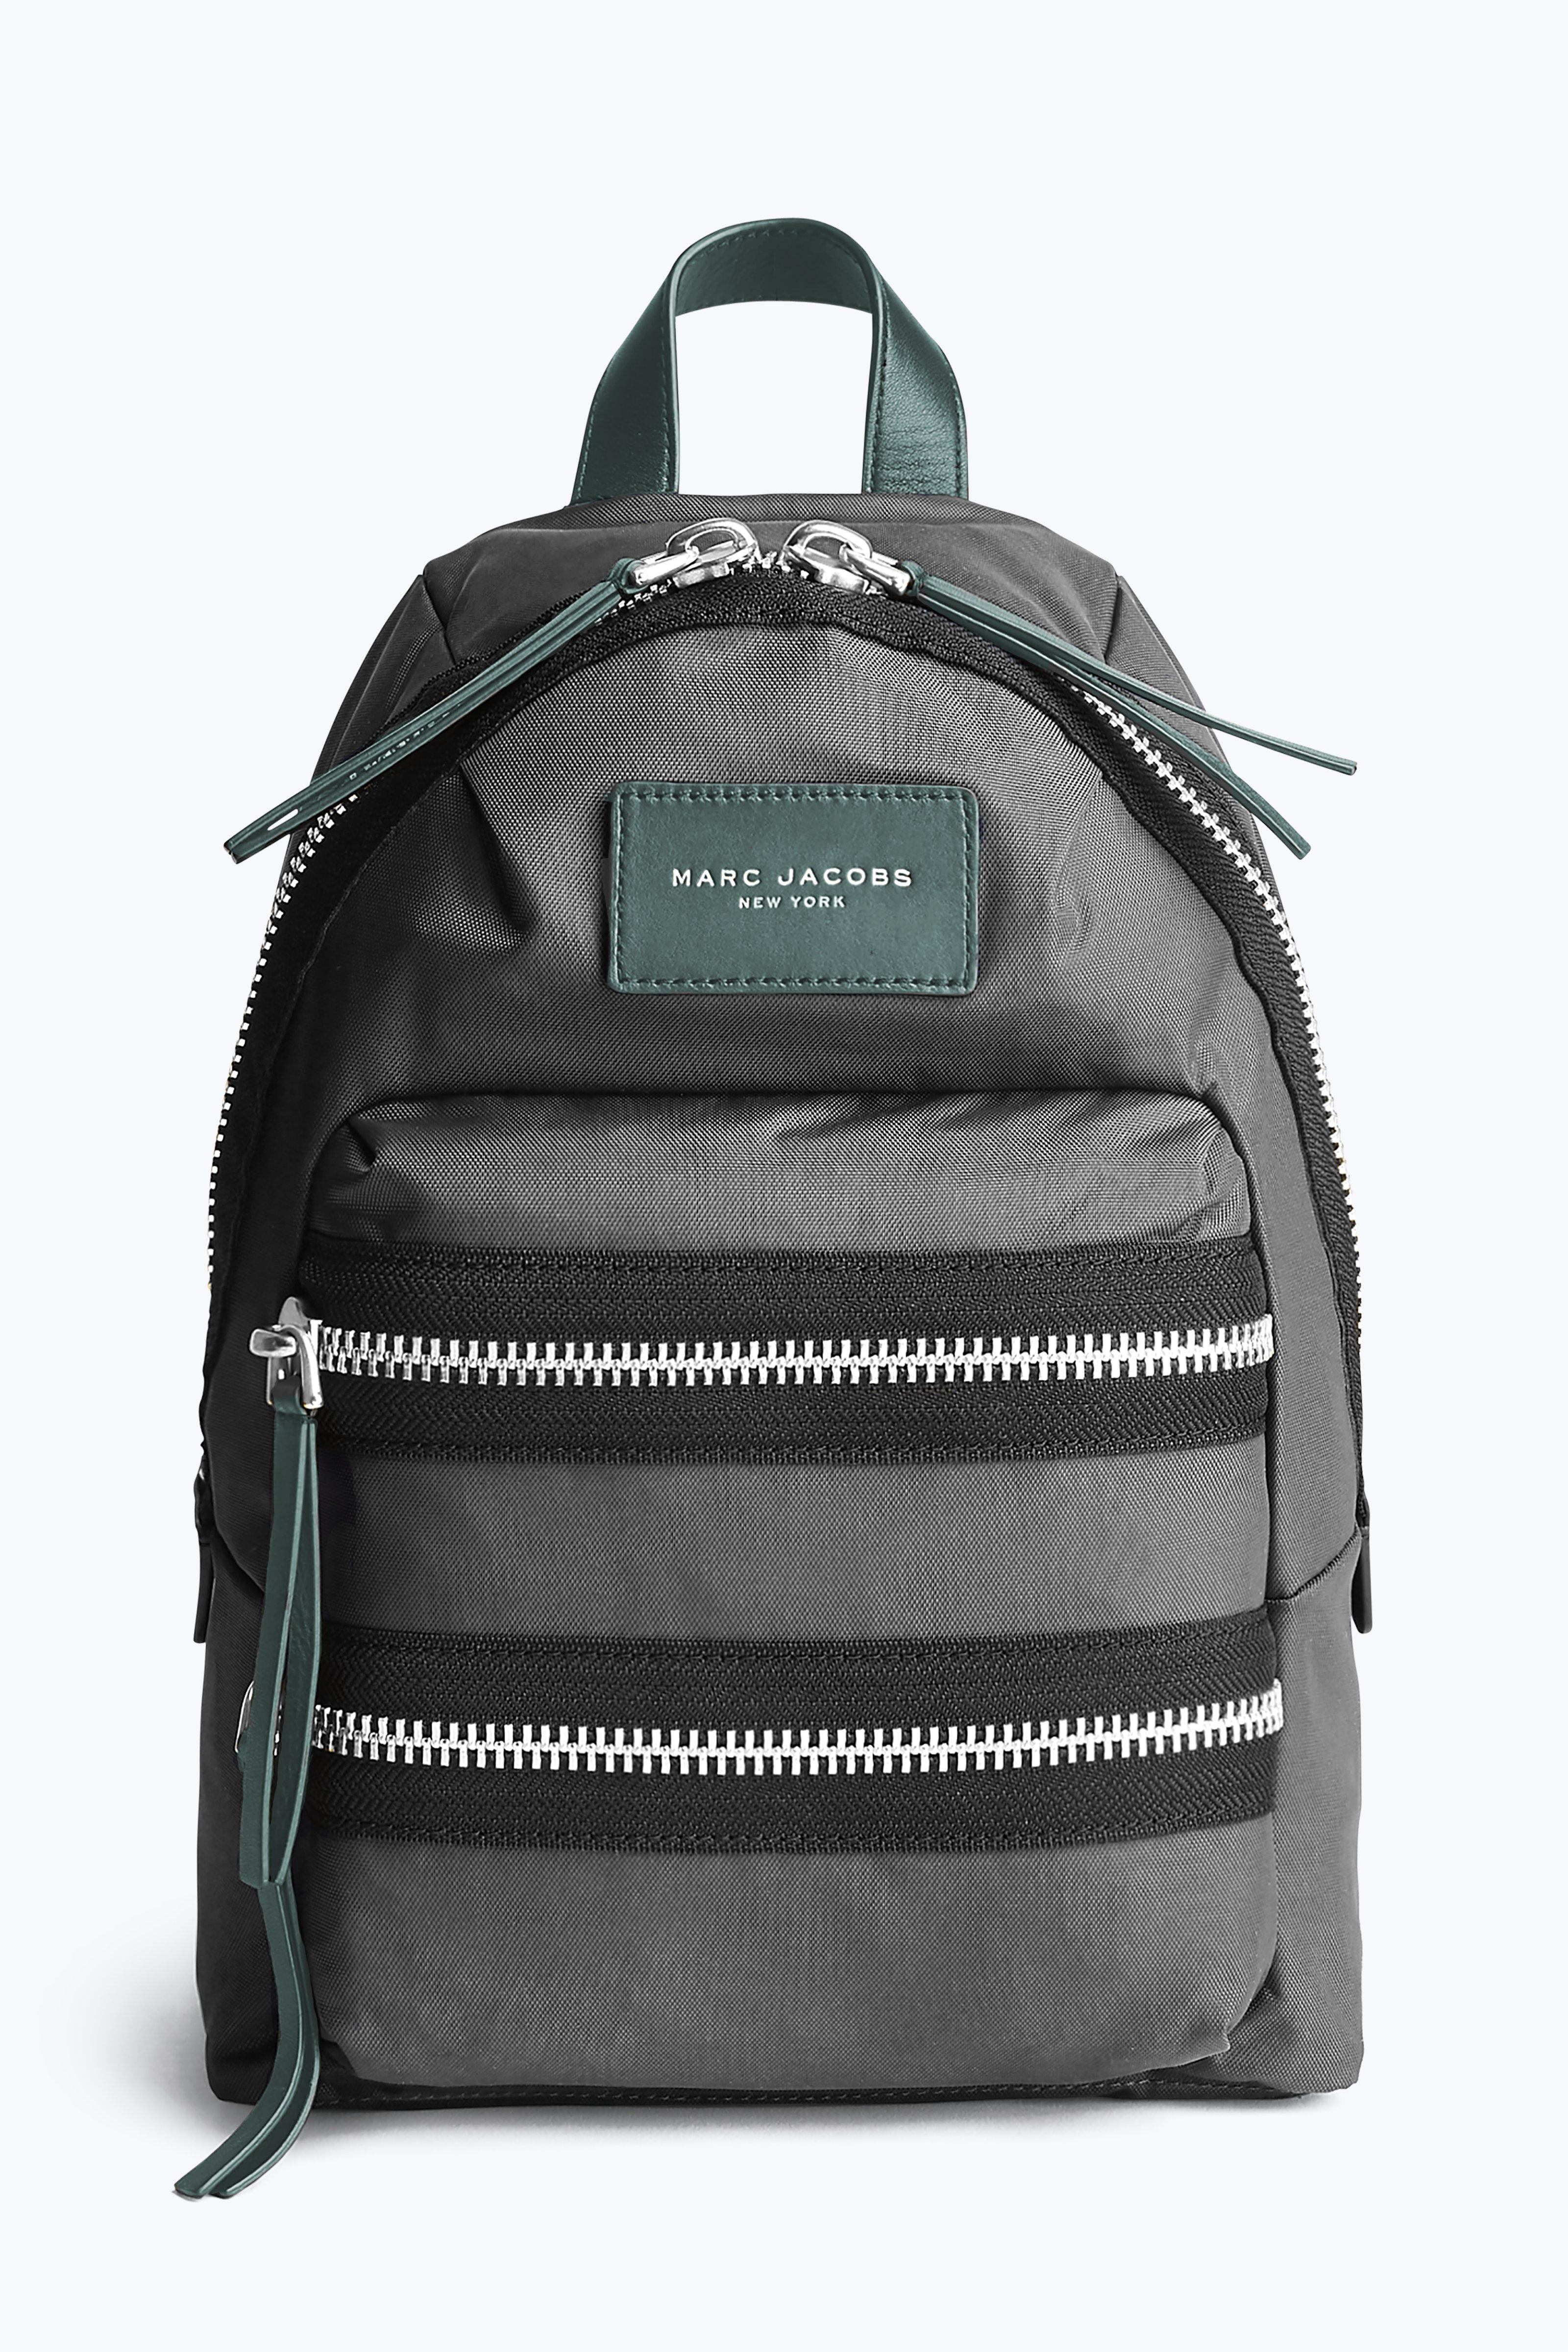 Marc Jacobs Nylon Biker Mini Backpack In Black